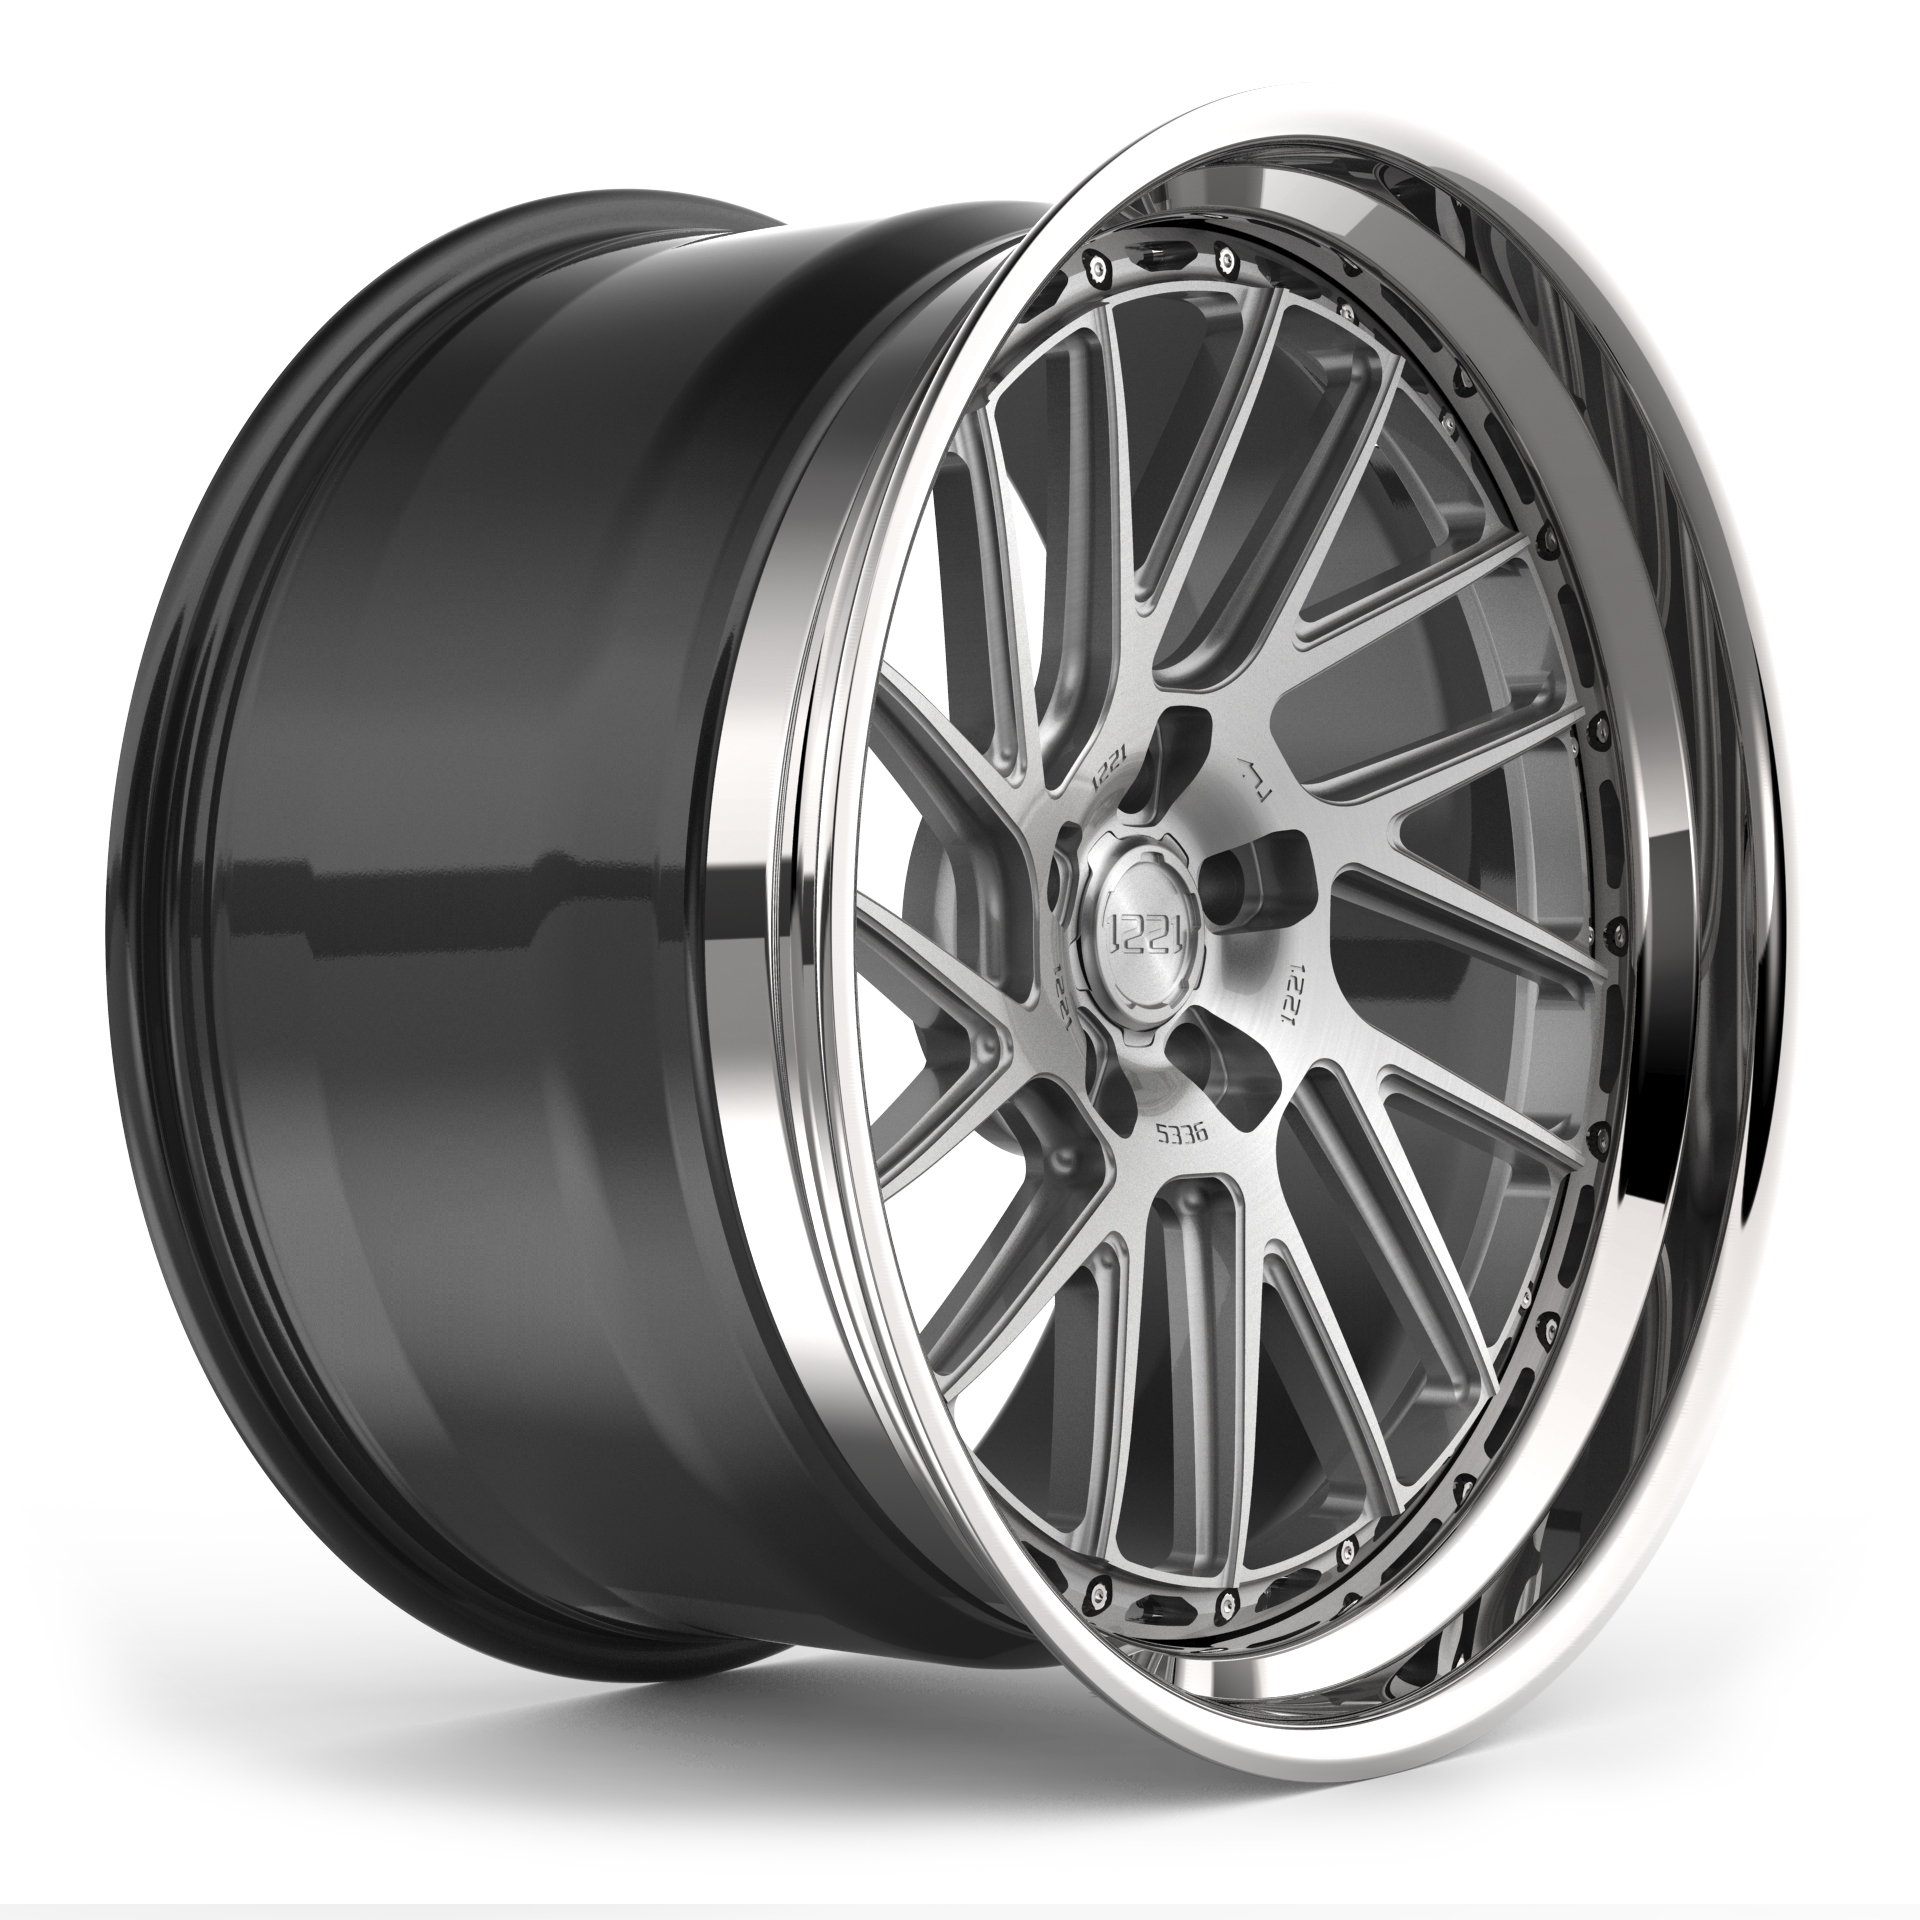 1221 Wheels R5336 AP3X APEX3.0 forged wheels